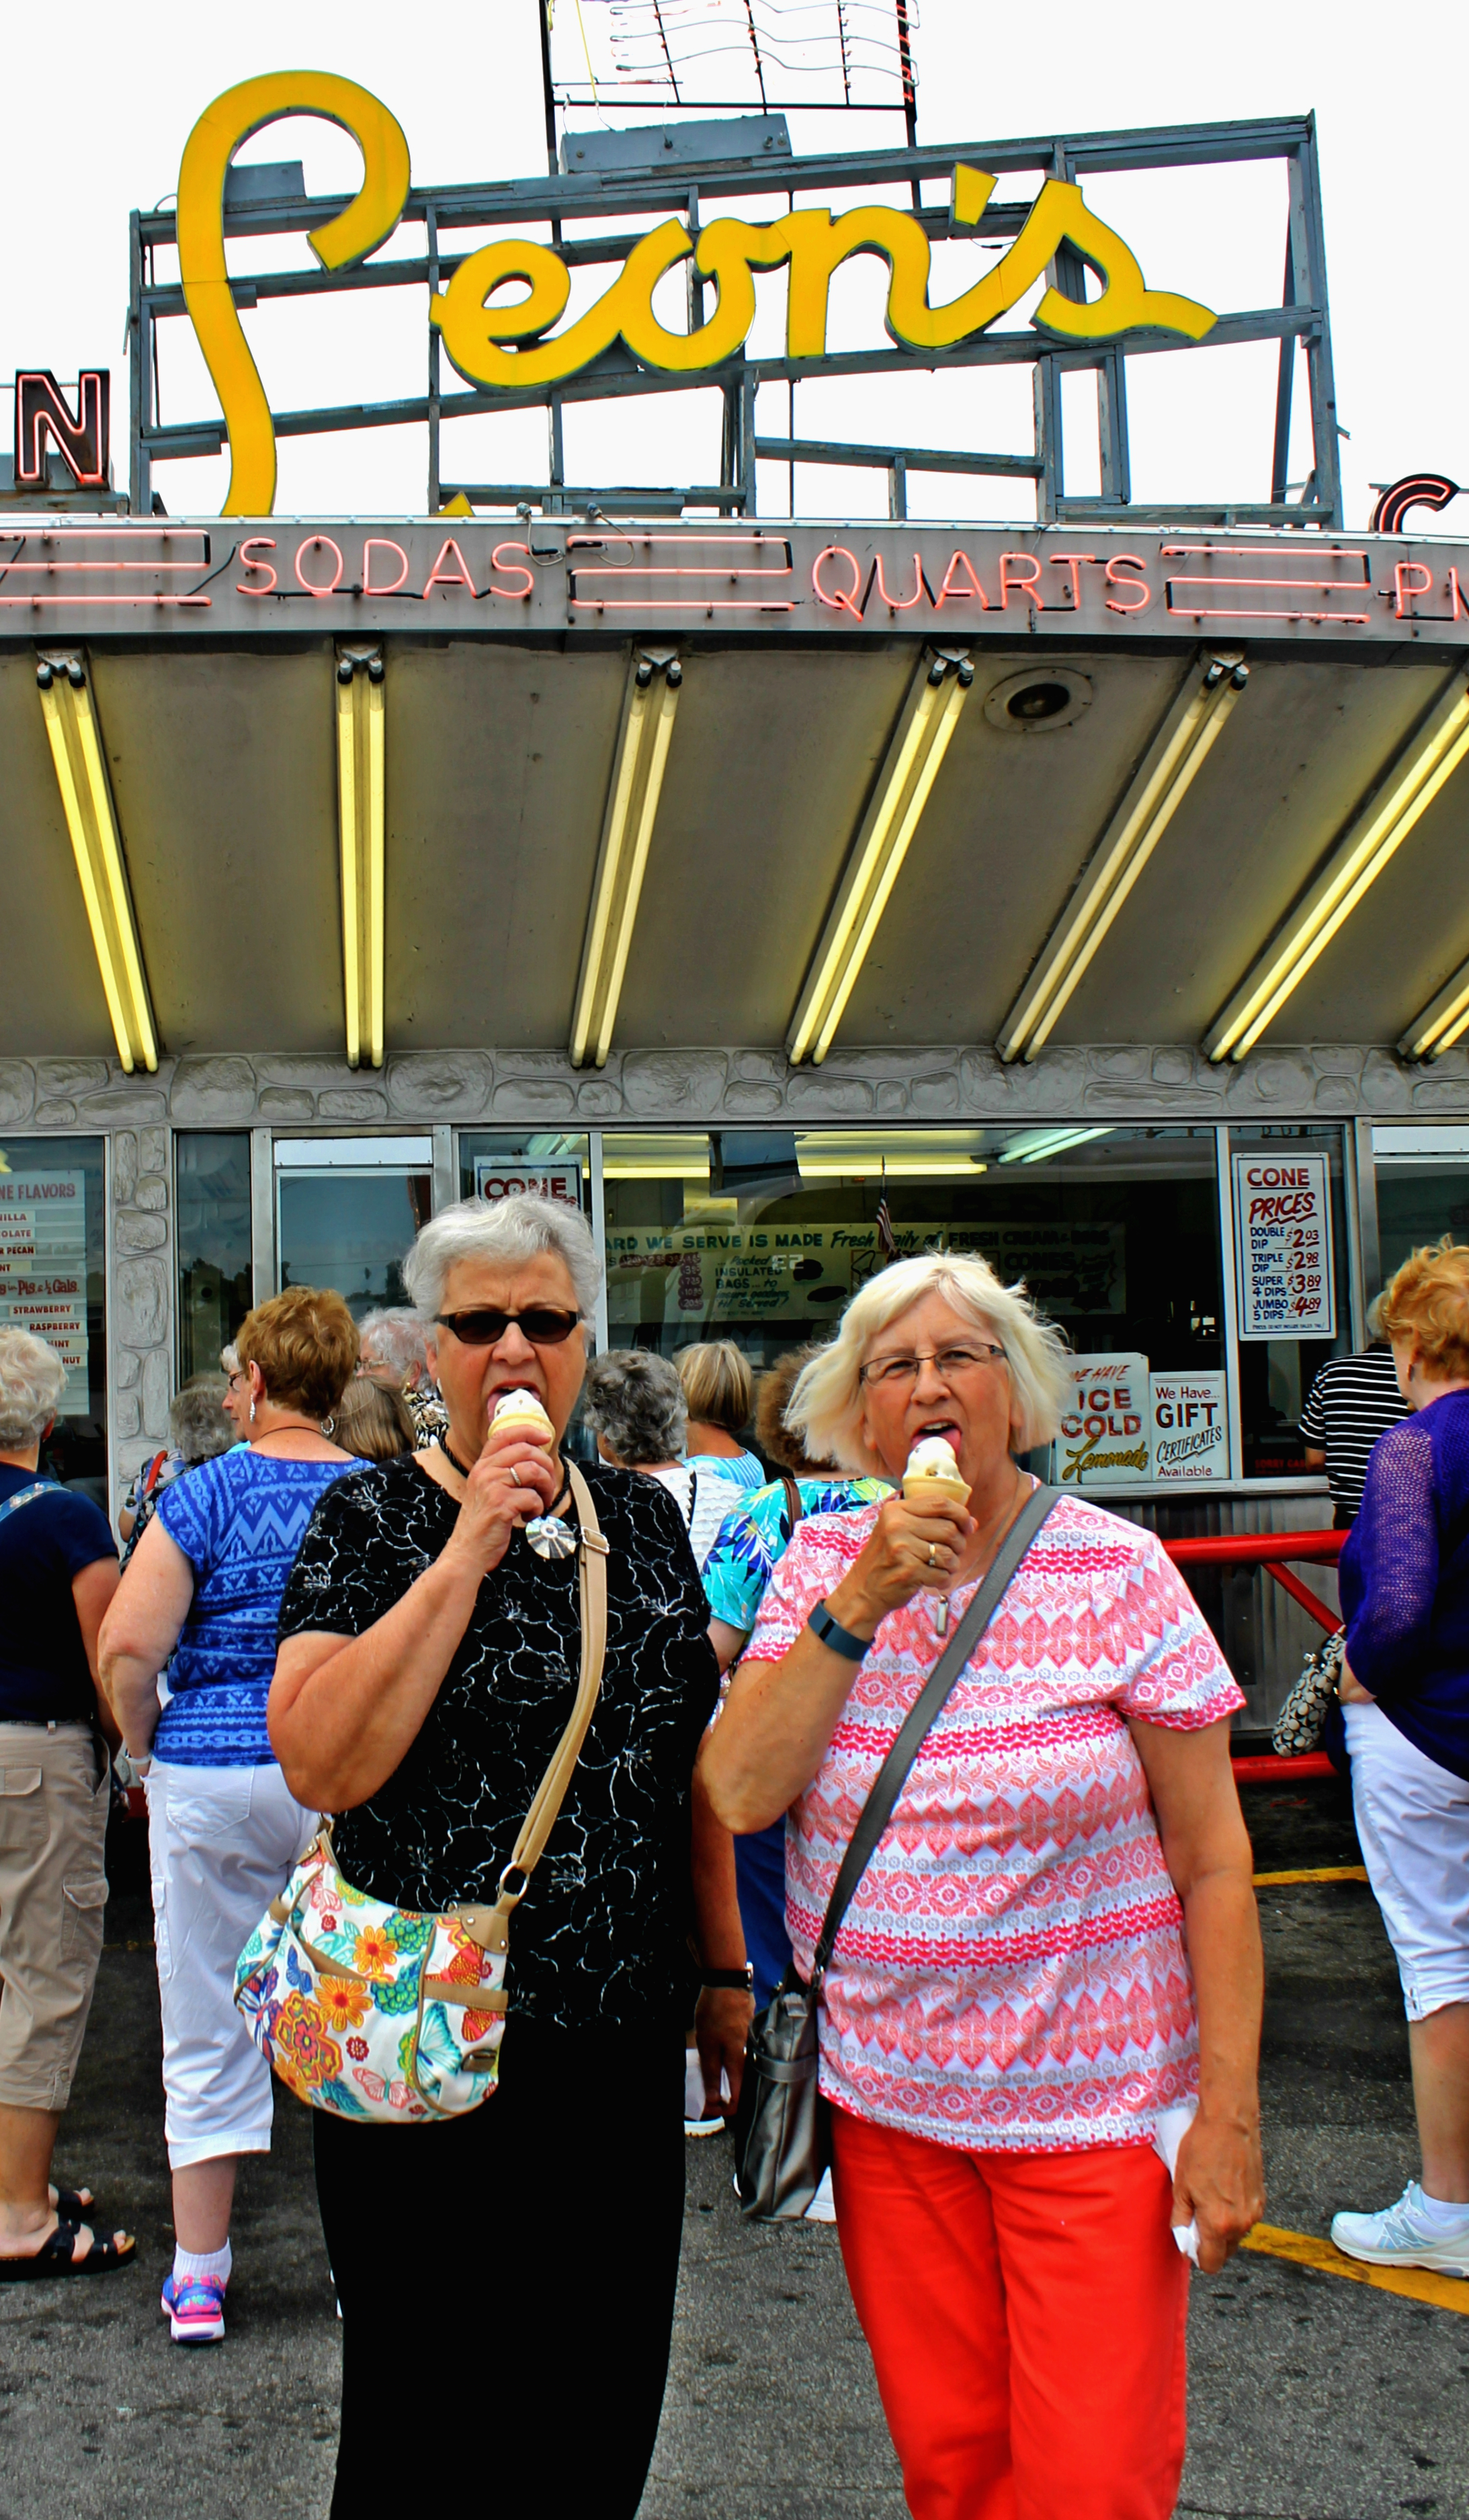 eating custard at leon's.jpg